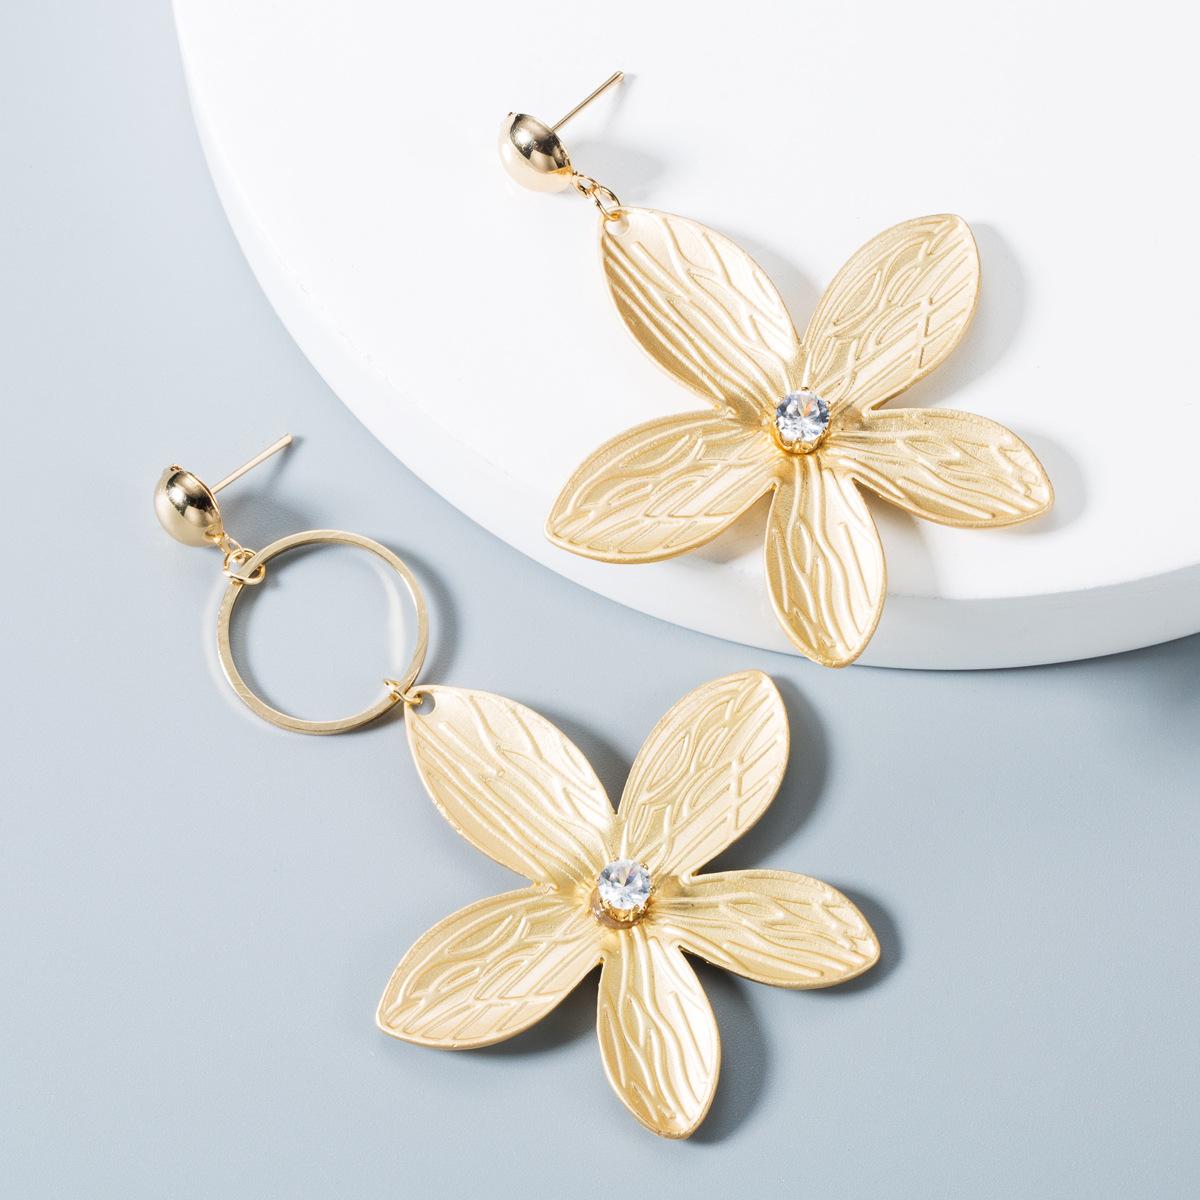 Creative spray paint flower alloy earrings NHLN157259